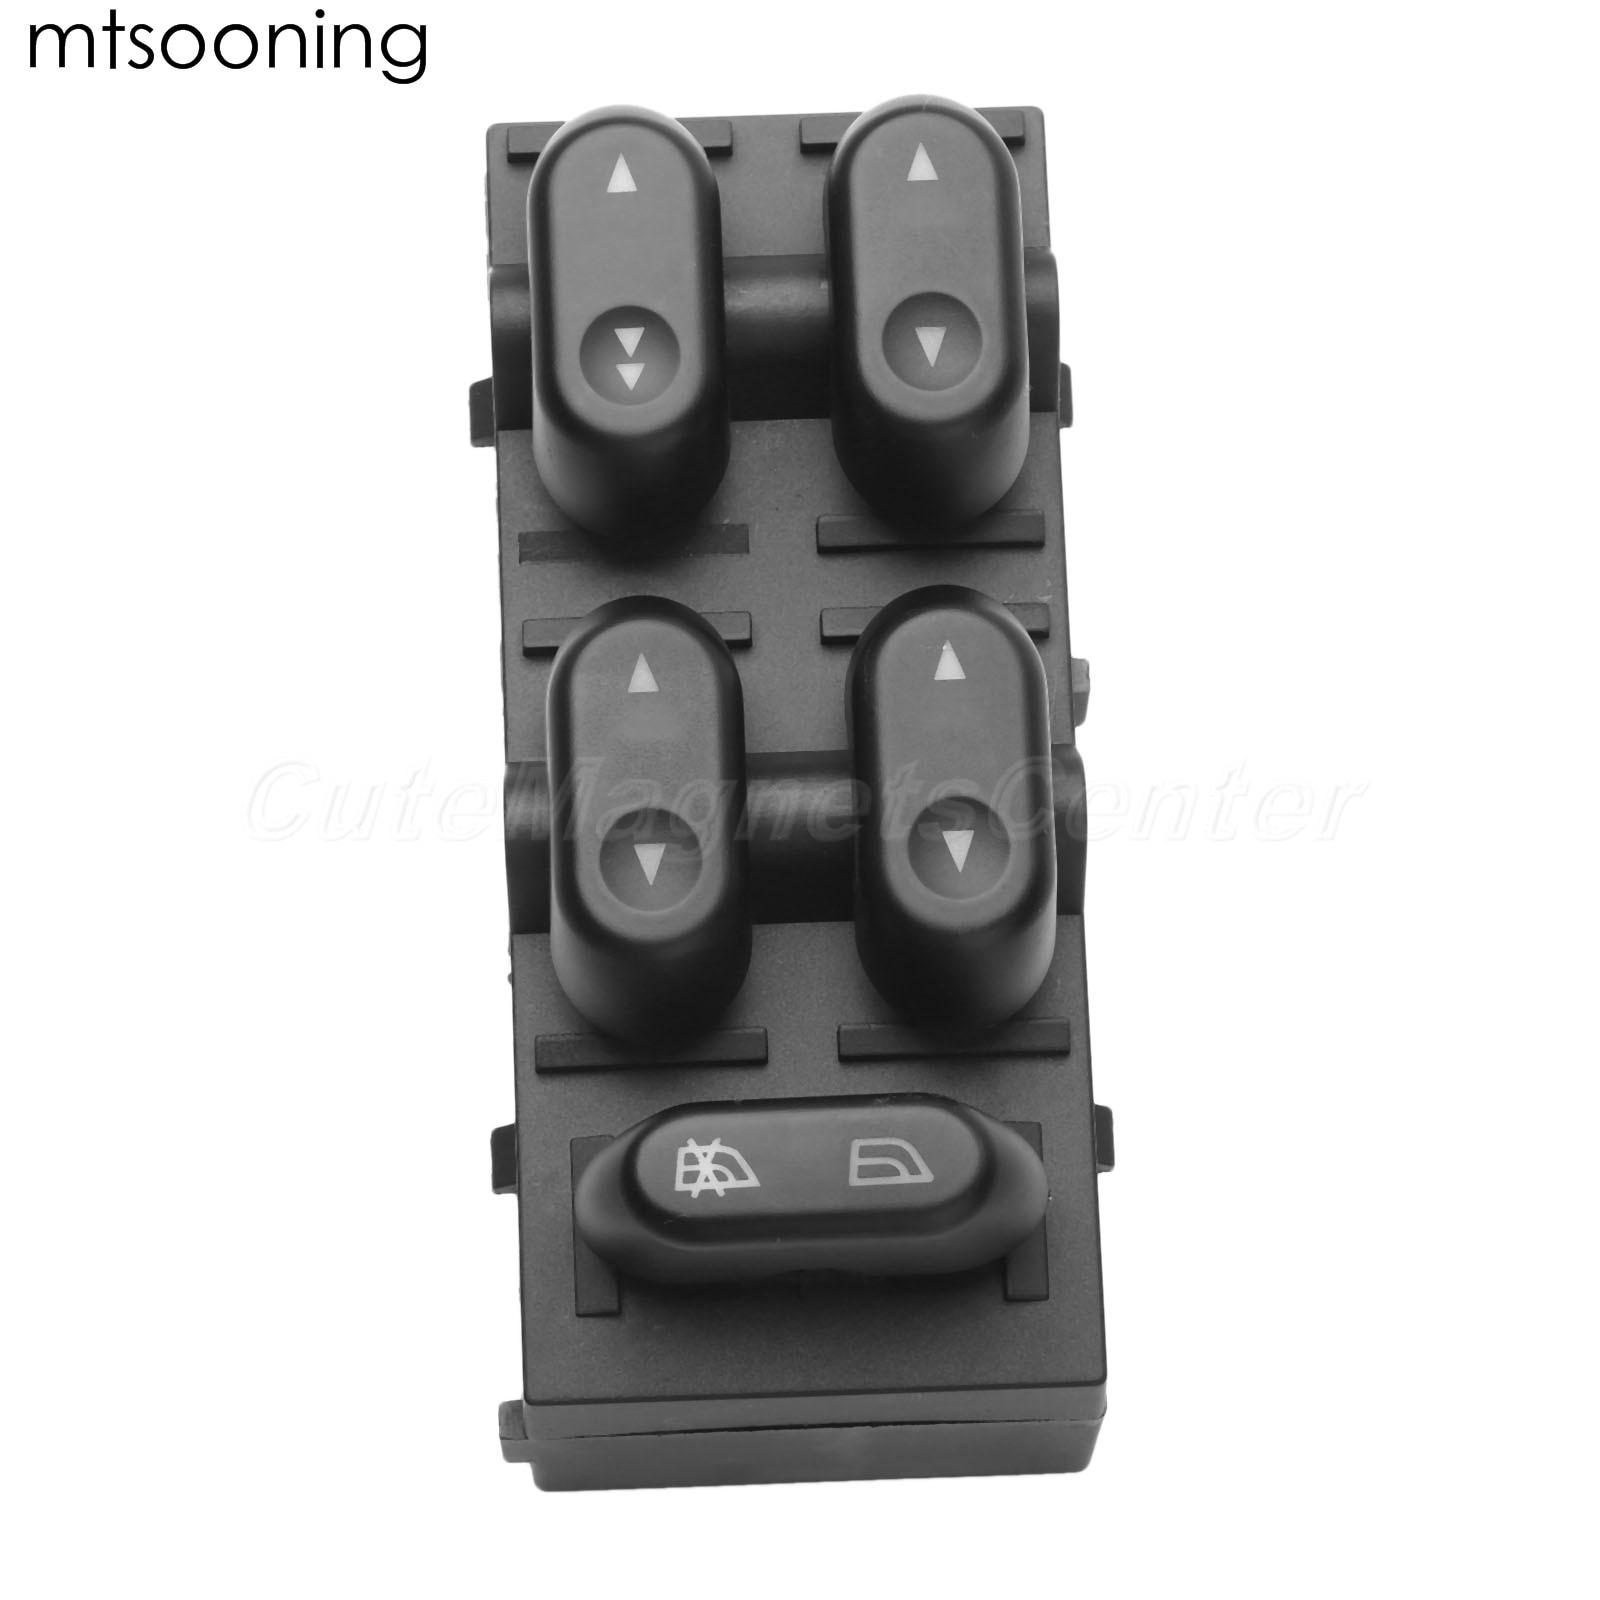 Interruptor principal de ventana eléctrica frontal LH, 5L1Z14529AA, para Ford F150, Crown, Victoria, Lobo, Mercury, 5L1Z-14529-AA